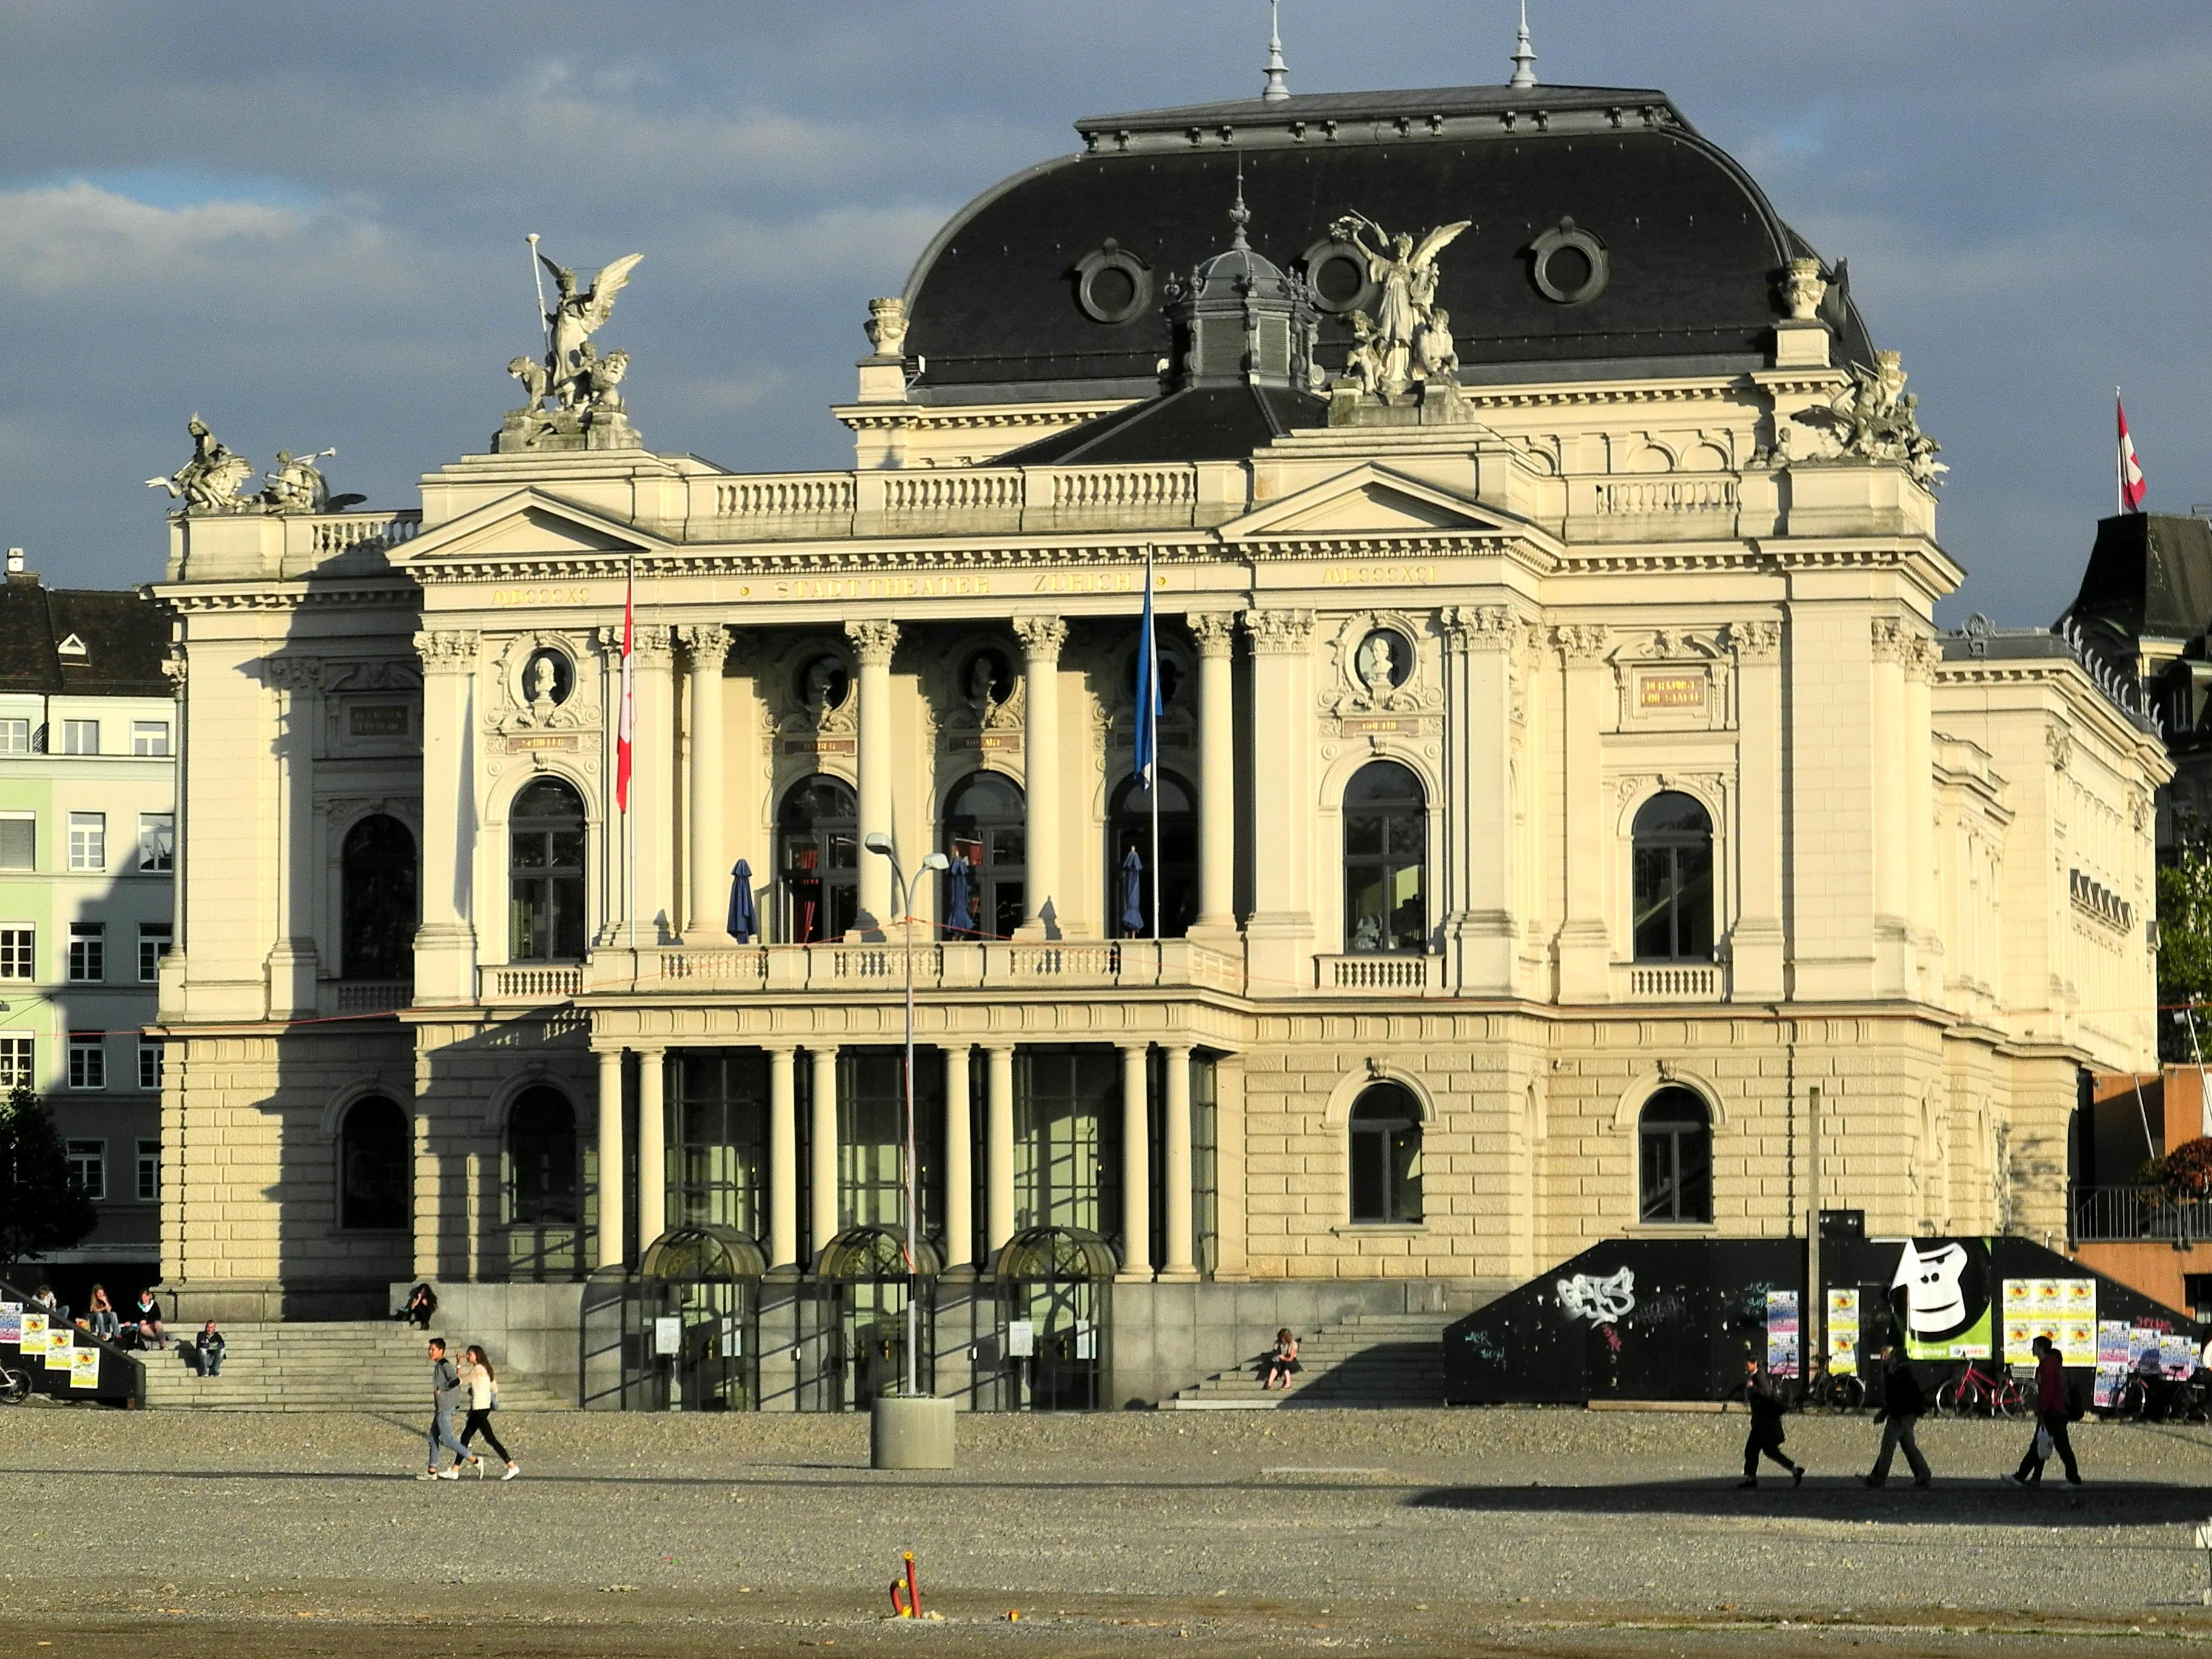 http://upload.wikimedia.org/wikipedia/commons/f/fd/Opernhaus_-_Sechsel%C3%A4utenplatz_2012-06-05_19-37-36_%28P7000%29.JPG